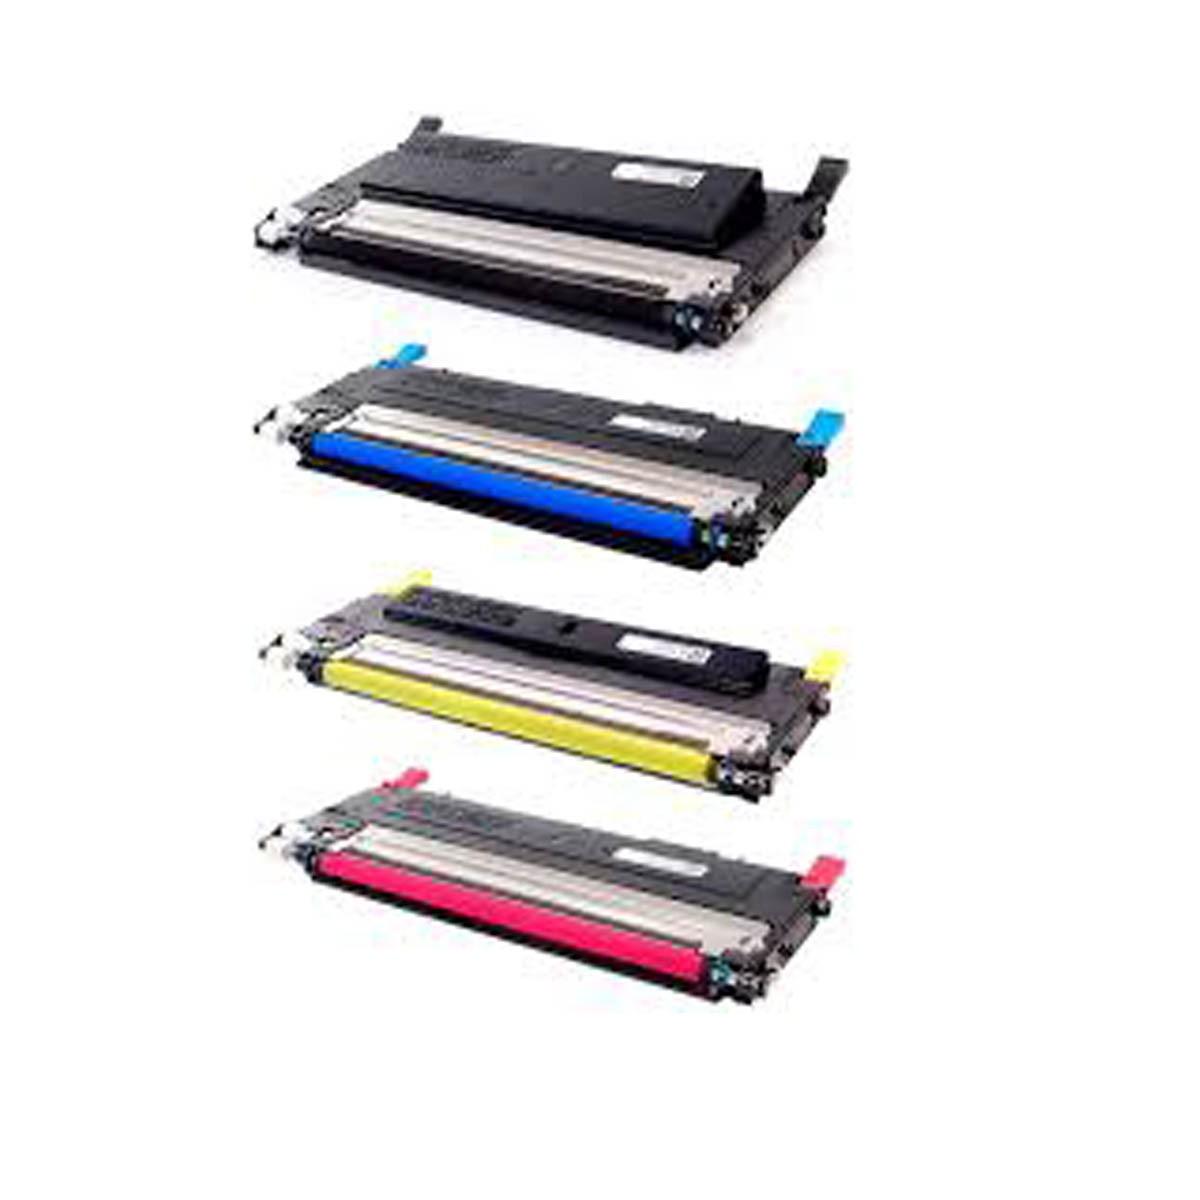 Kit 4 Toner Compatível CLT-407 407S para Samsung CLP-320 CLP-325 CLX-3185 JI-99PV-NYOV